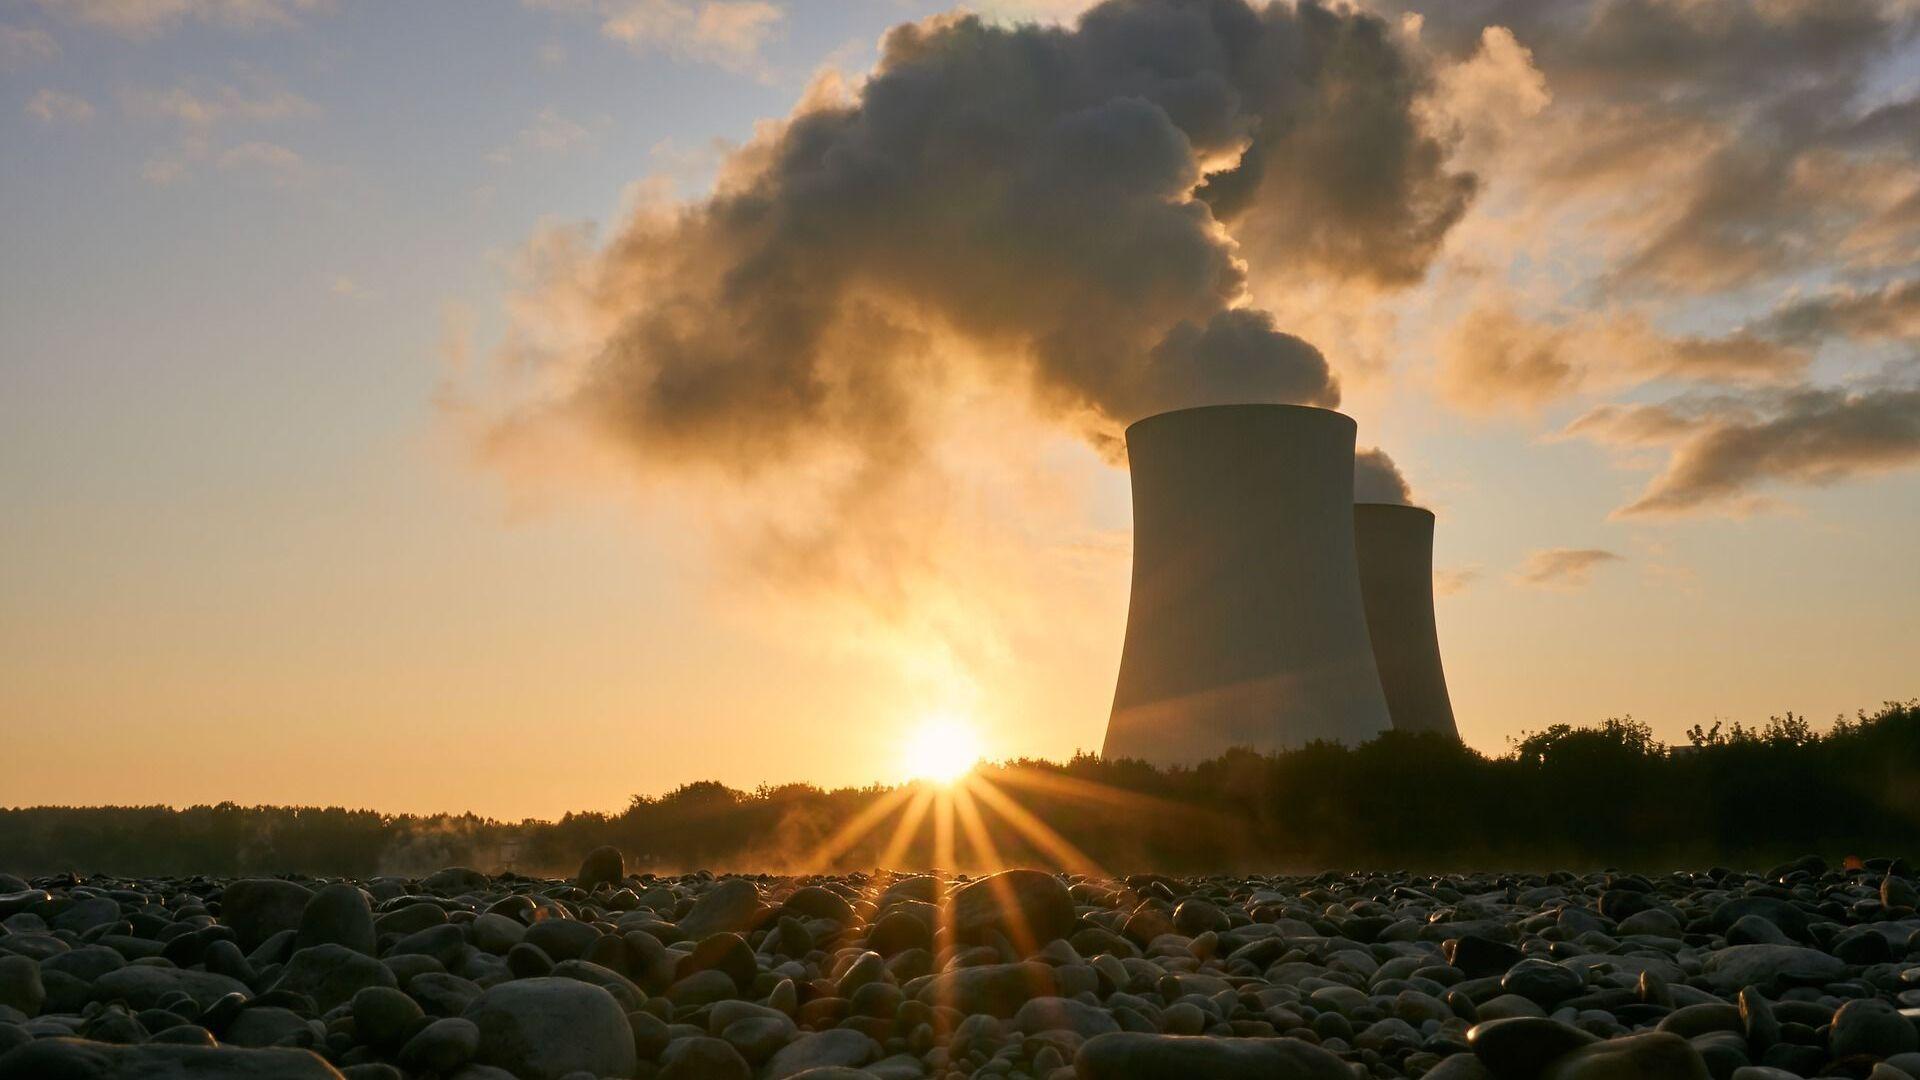 Una planta nuclear - Sputnik Mundo, 1920, 13.10.2021